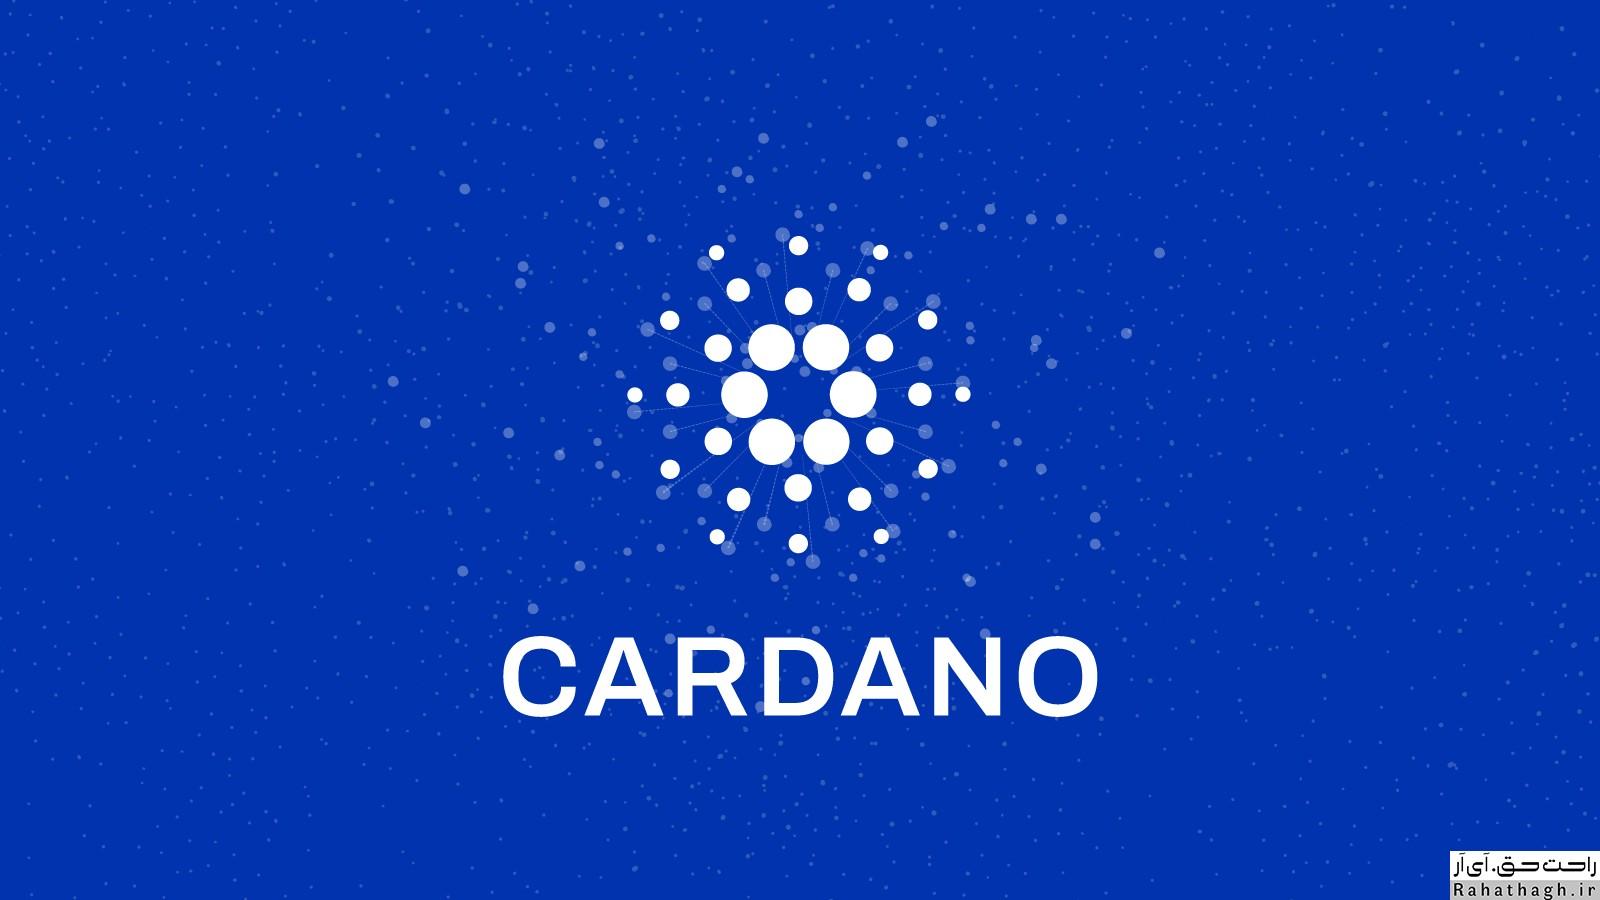 https://bayanbox.ir/view/310457225428321182/cardano-el-salvador-%D8%B1%D8%A7%D8%AD%D8%AA-%D8%AD%D9%82.jpg